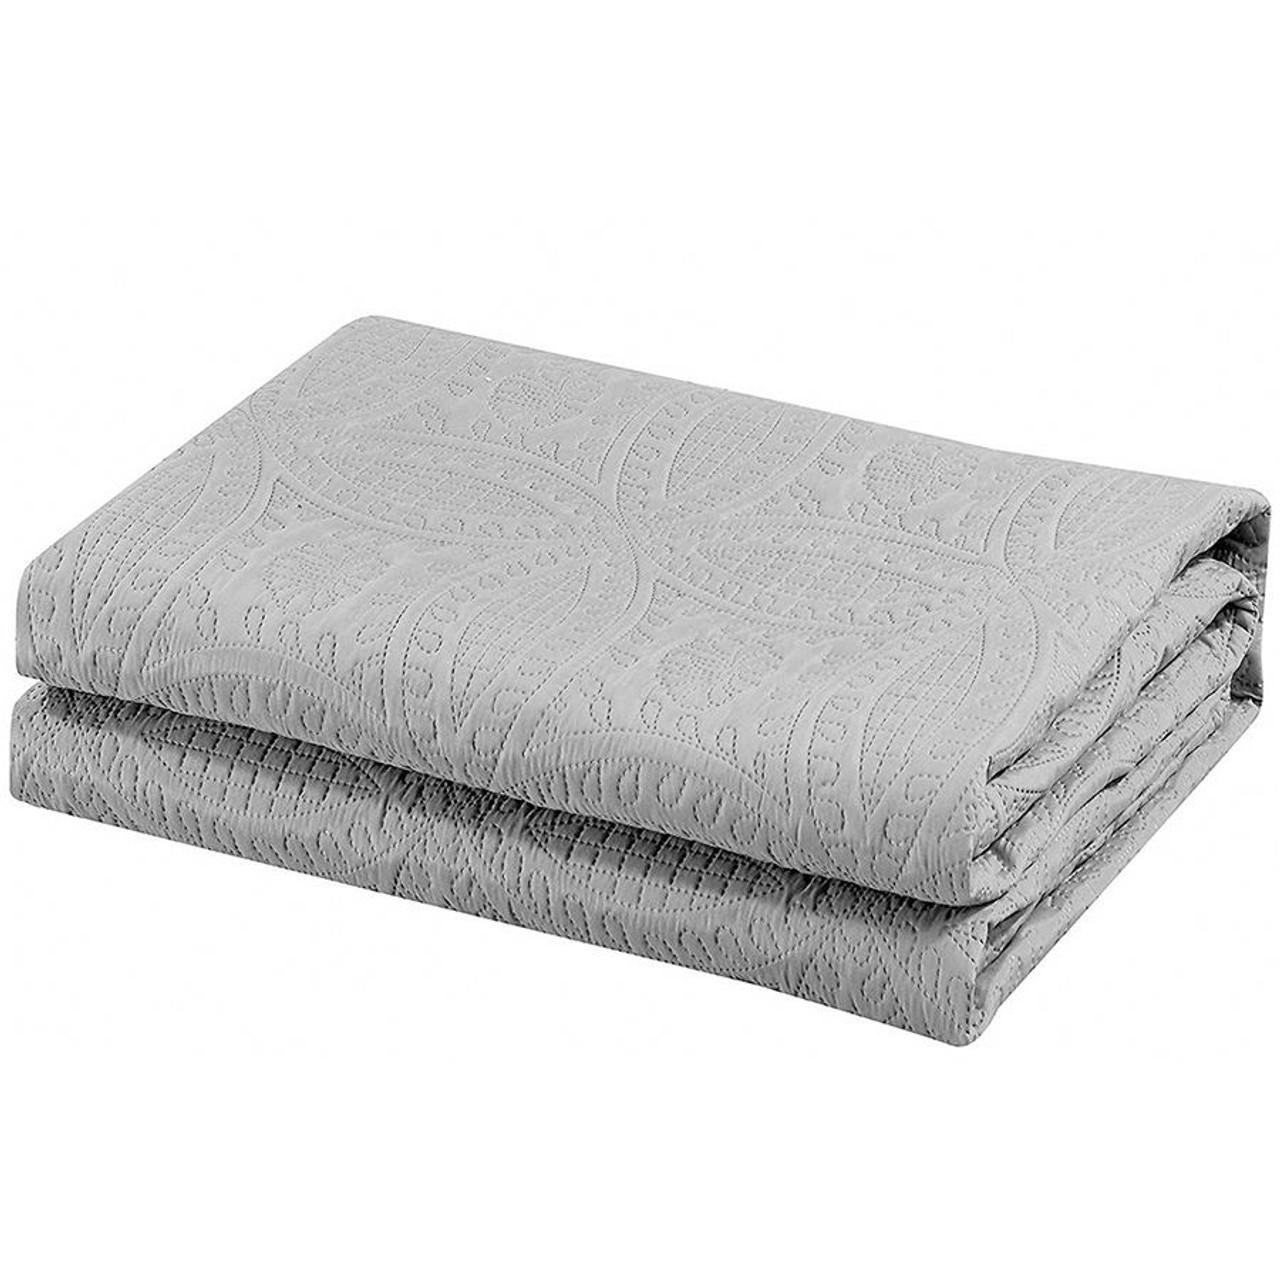 3 Pc Oversized Bedspread Coverlet Set Charcoal Color in USA, California, New York, NY City, Los Angeles, San Francisco, Pennsylvania, Washington DC, Virginia and MD